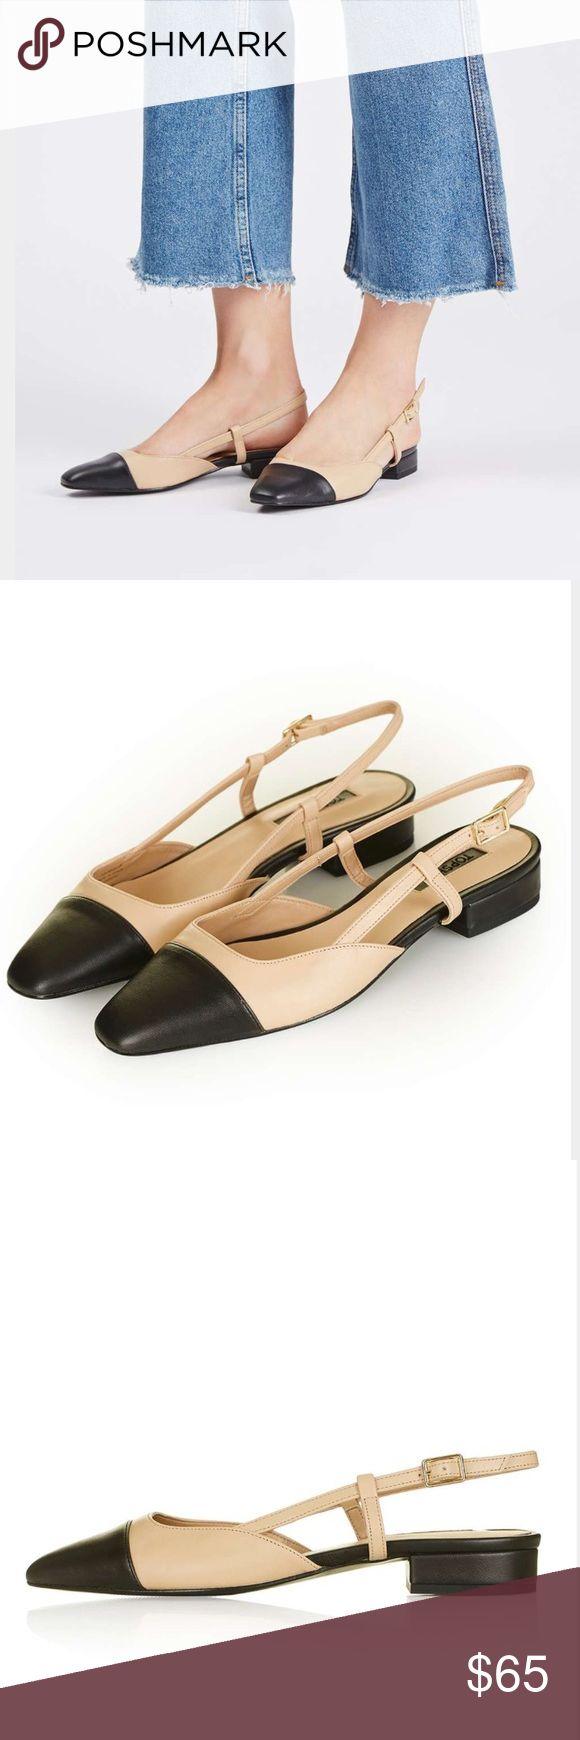 NWT Topshop slingback flats sz 7.5 Light tan and black flats. Tagged euro sz 38/US sz 7.5. Never worn. Topshop Shoes